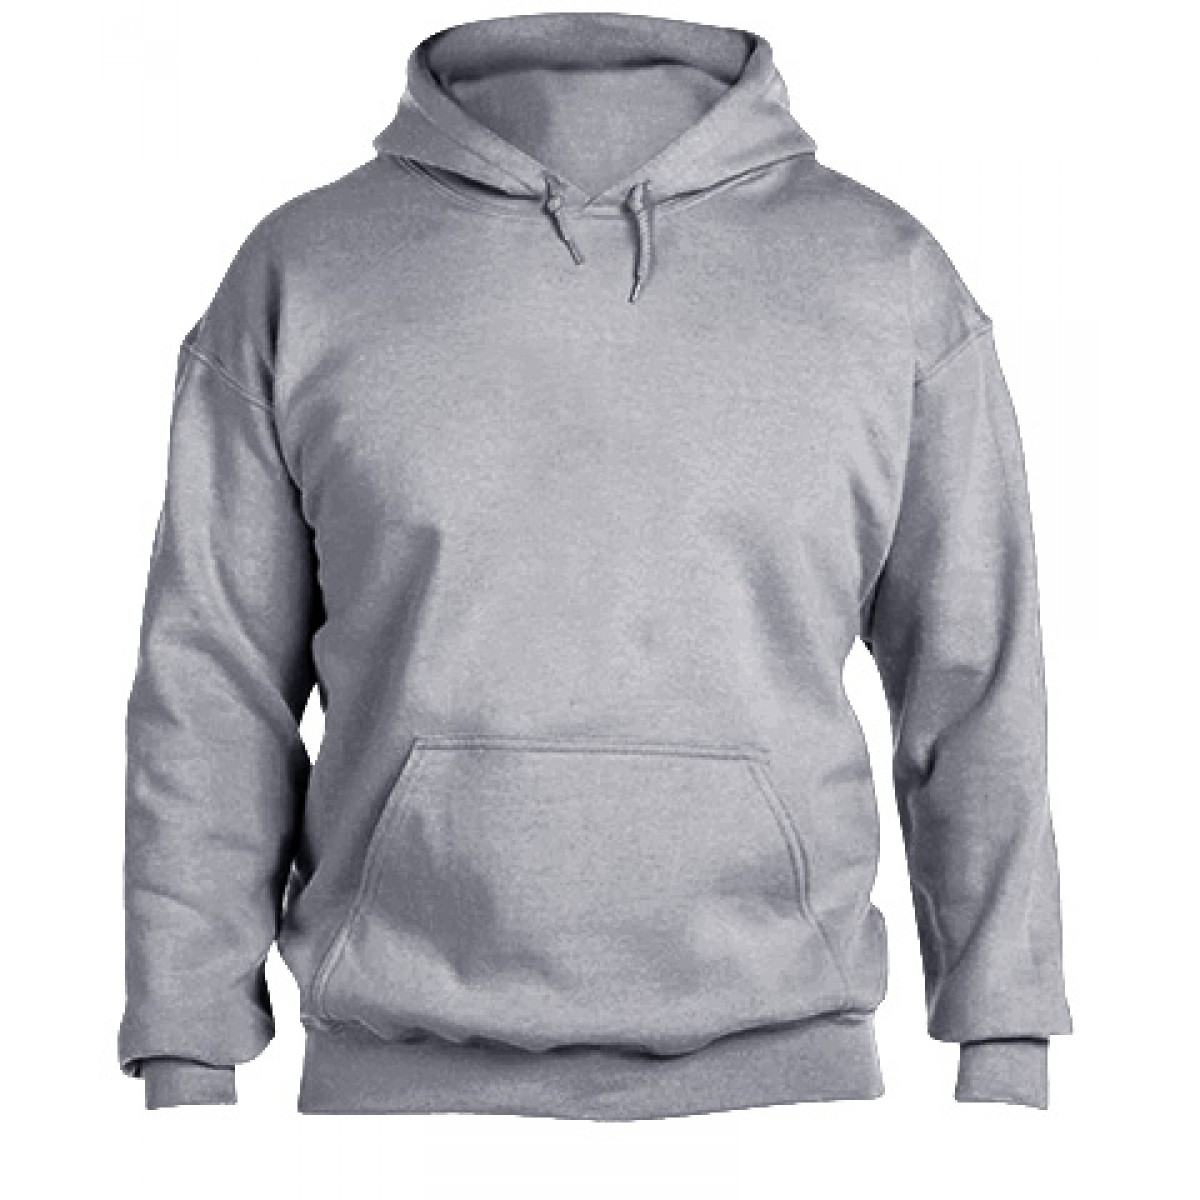 Hooded Sweatshirt 50/50 Heavy Blend-Sports Grey-M